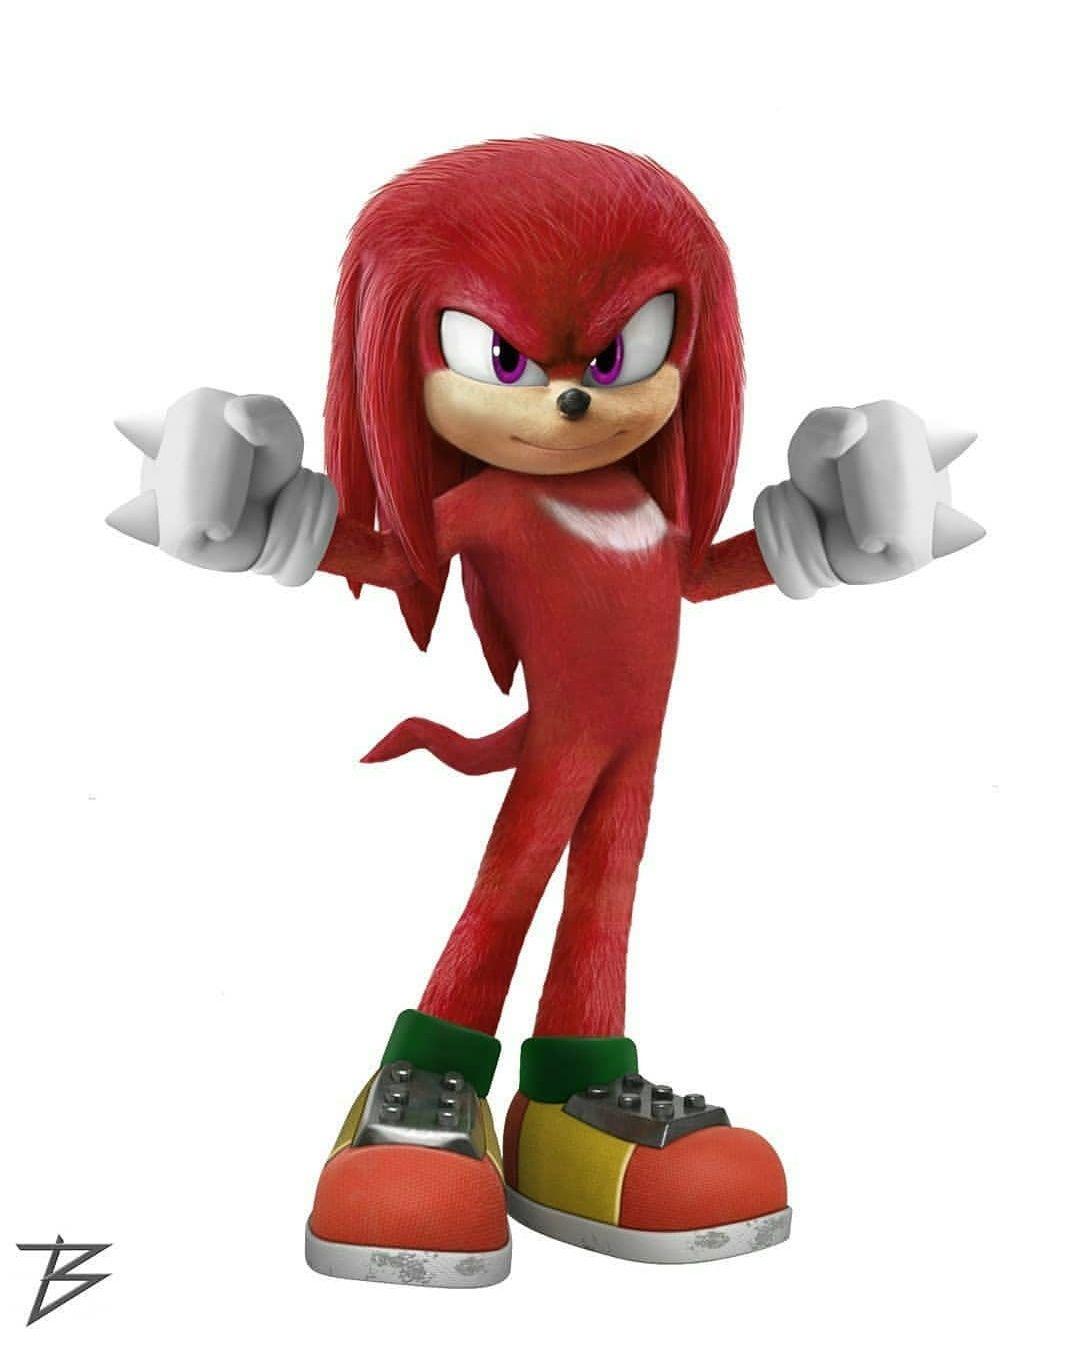 Knuckles Movie Type In 2020 Hedgehog Movie Sonic Fan Characters Sonic